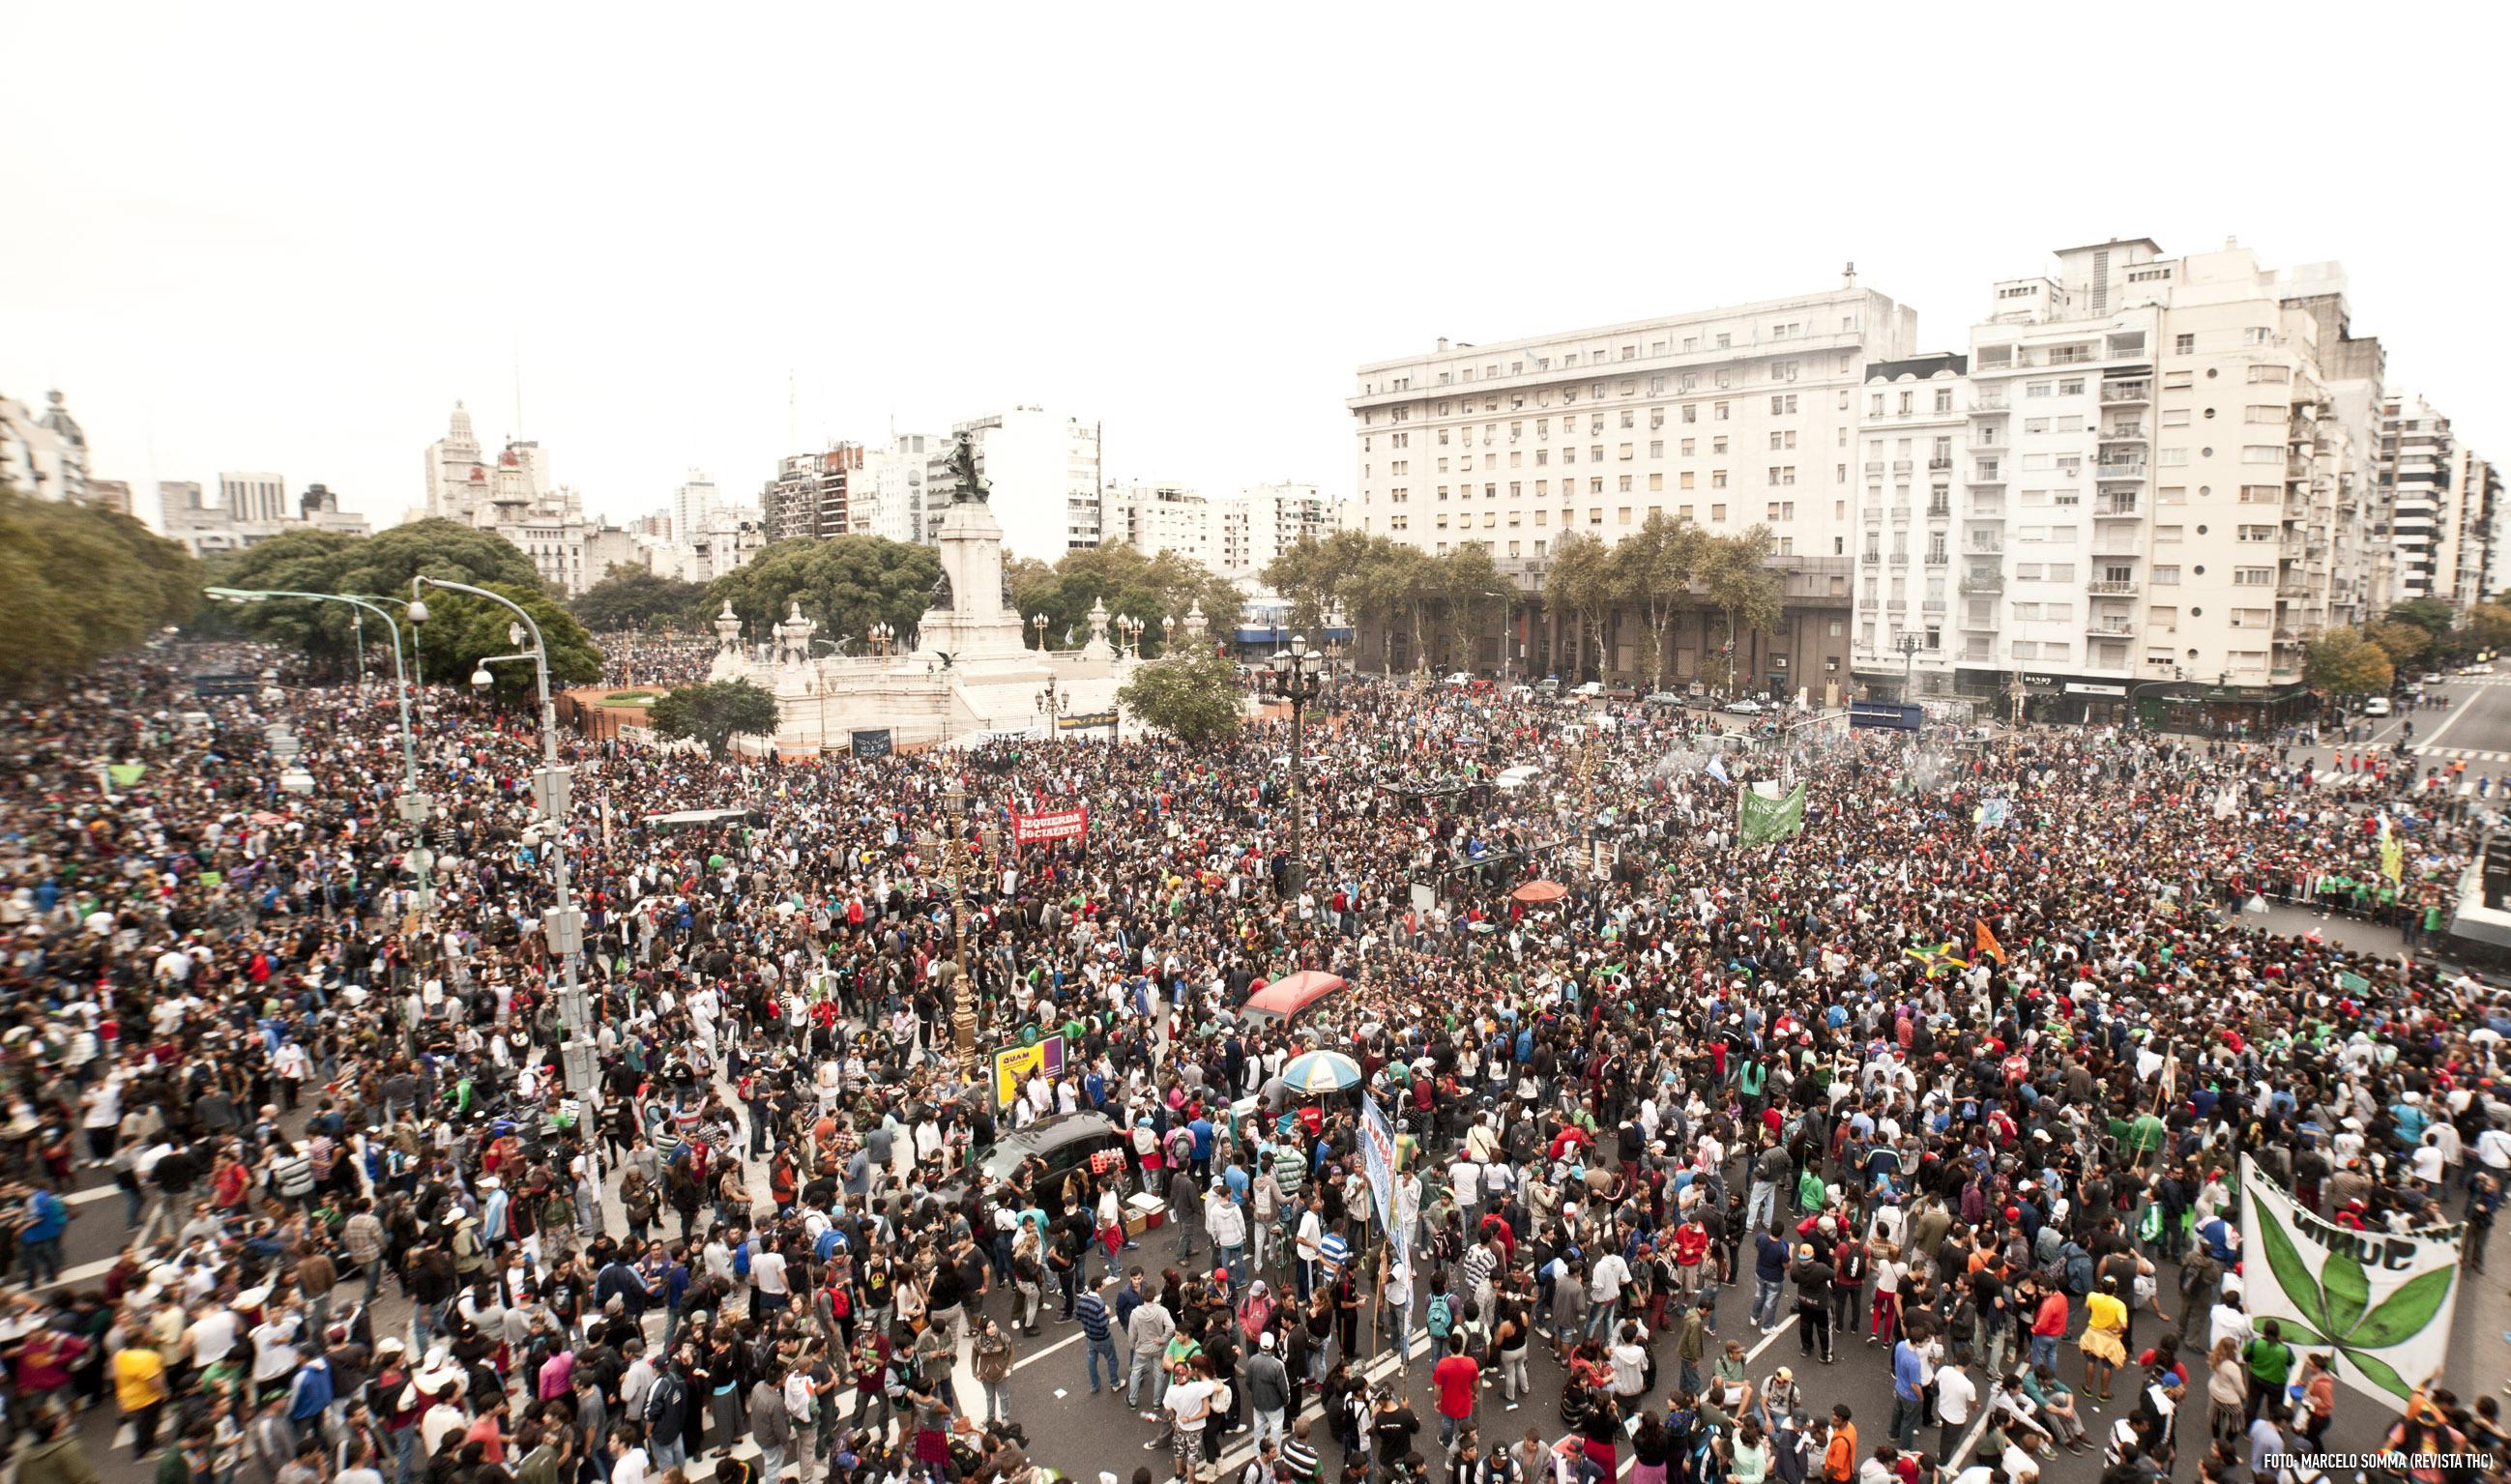 Marcha Marihuana 2014 - Buenos Aires - 150 mil personas - Congreso - Creditos Marcelo Somma - Revista THC